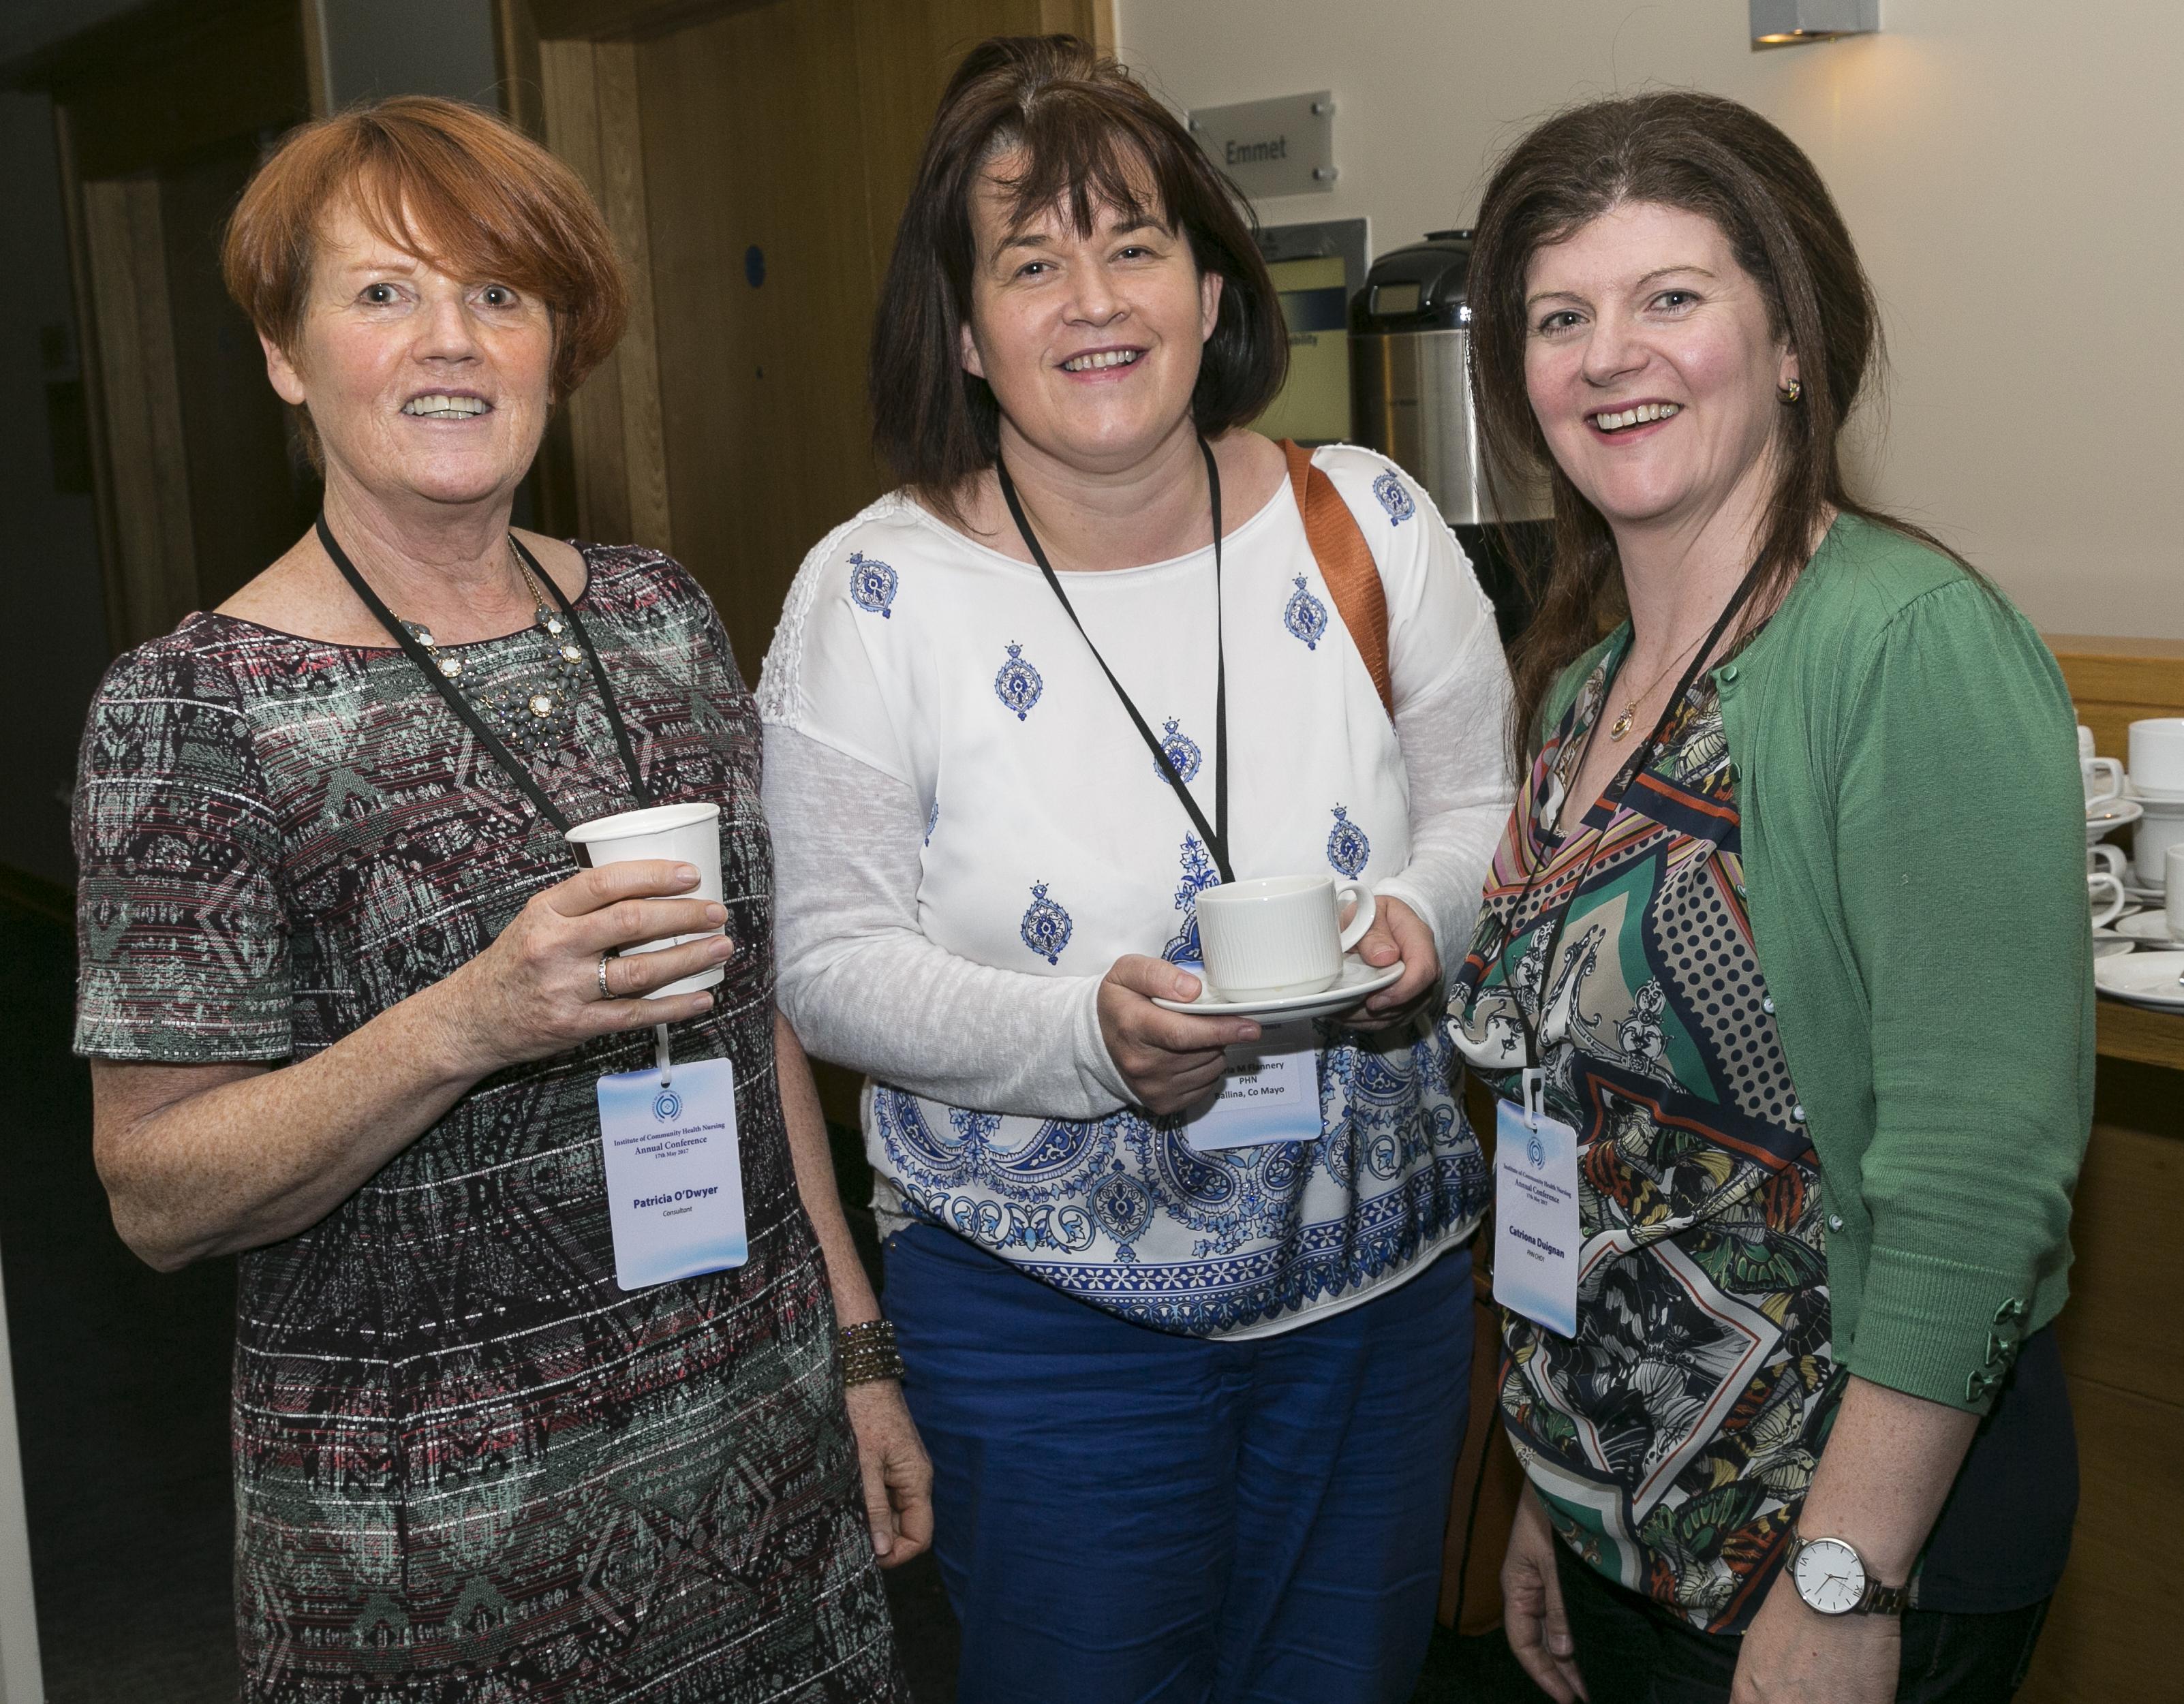 Institute of Community Health Nursing, Conference 2017, held in The Hilton Hotel, Kilmainham, Dublin. May 2017. Photographer - Paul Sherwood paul@sherwood.ie 087 230 9096